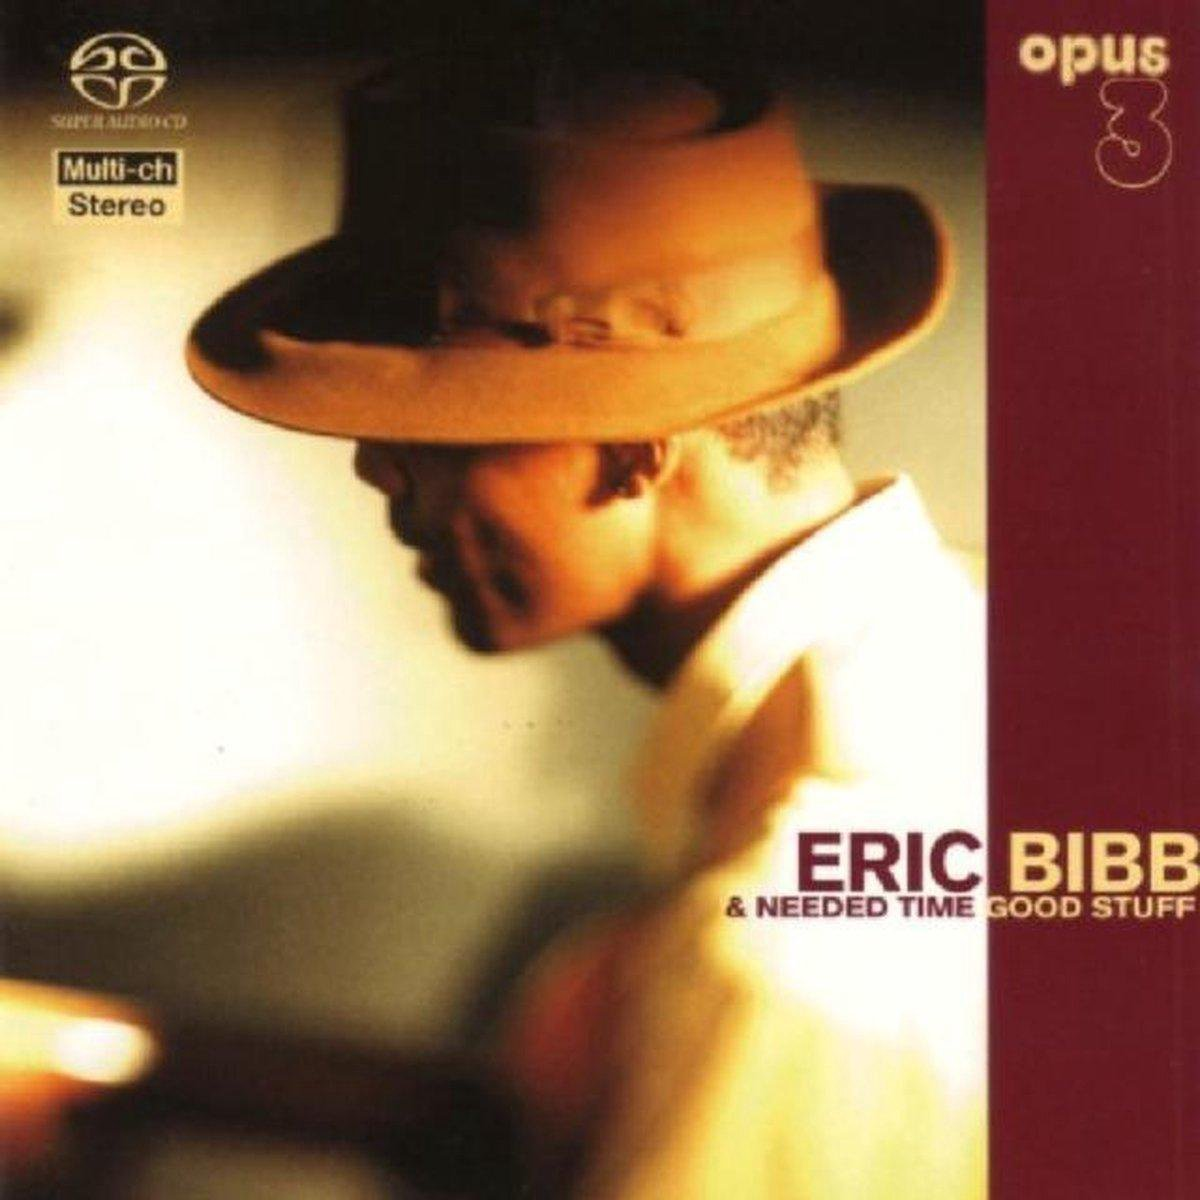 Bol Com Good Stuff Eric Needed Time Bibb Muziek